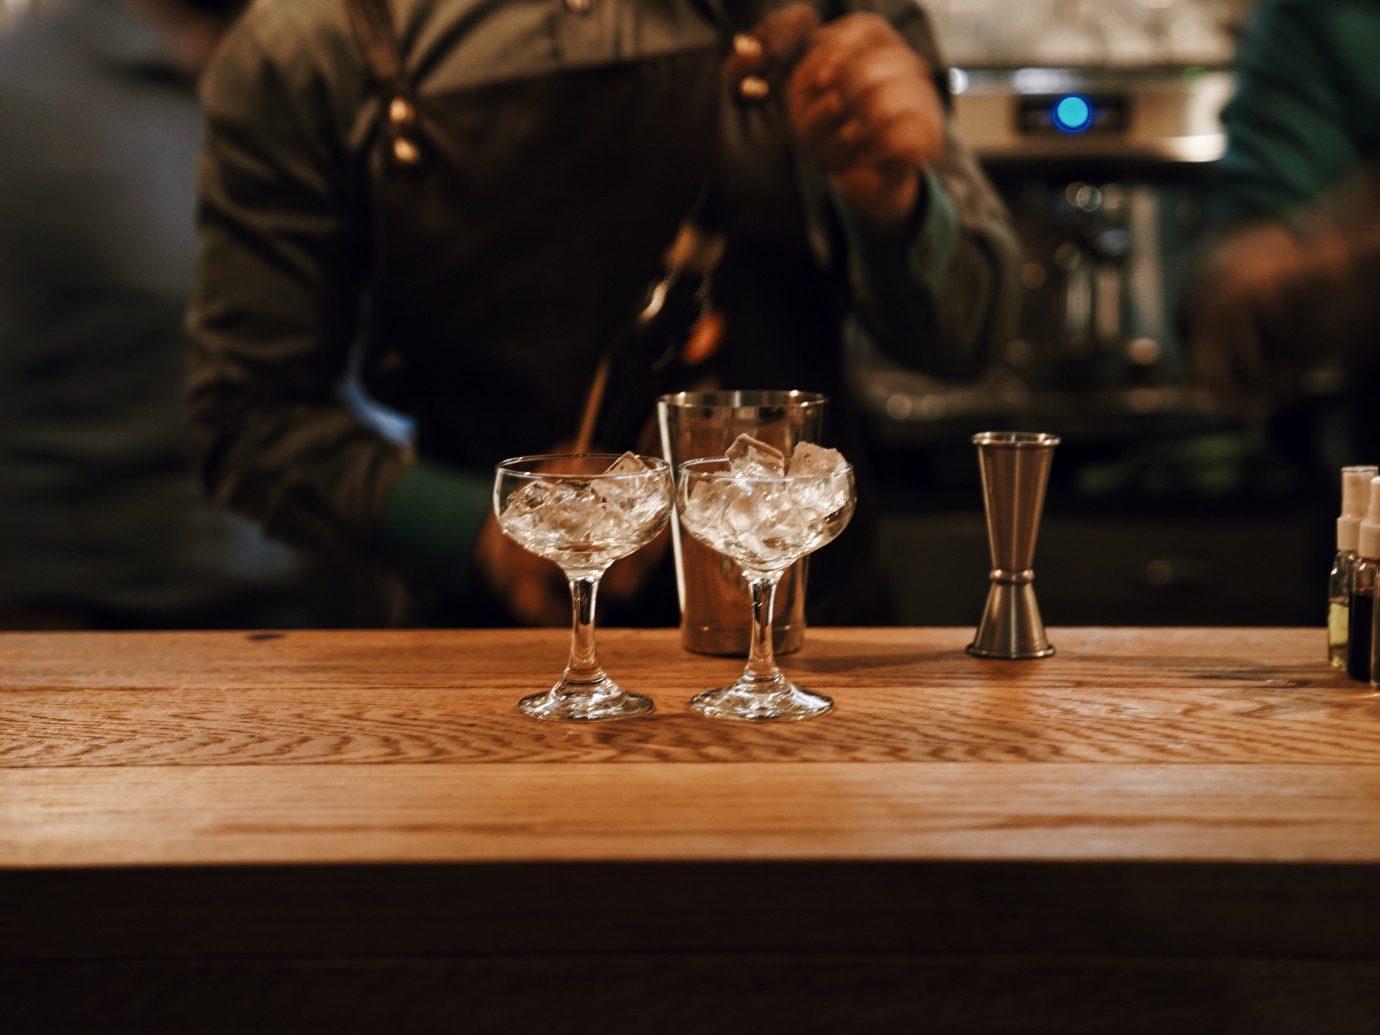 Boutique Hotels table wine person indoor glasses Drink wooden distilled beverage drinking Bar